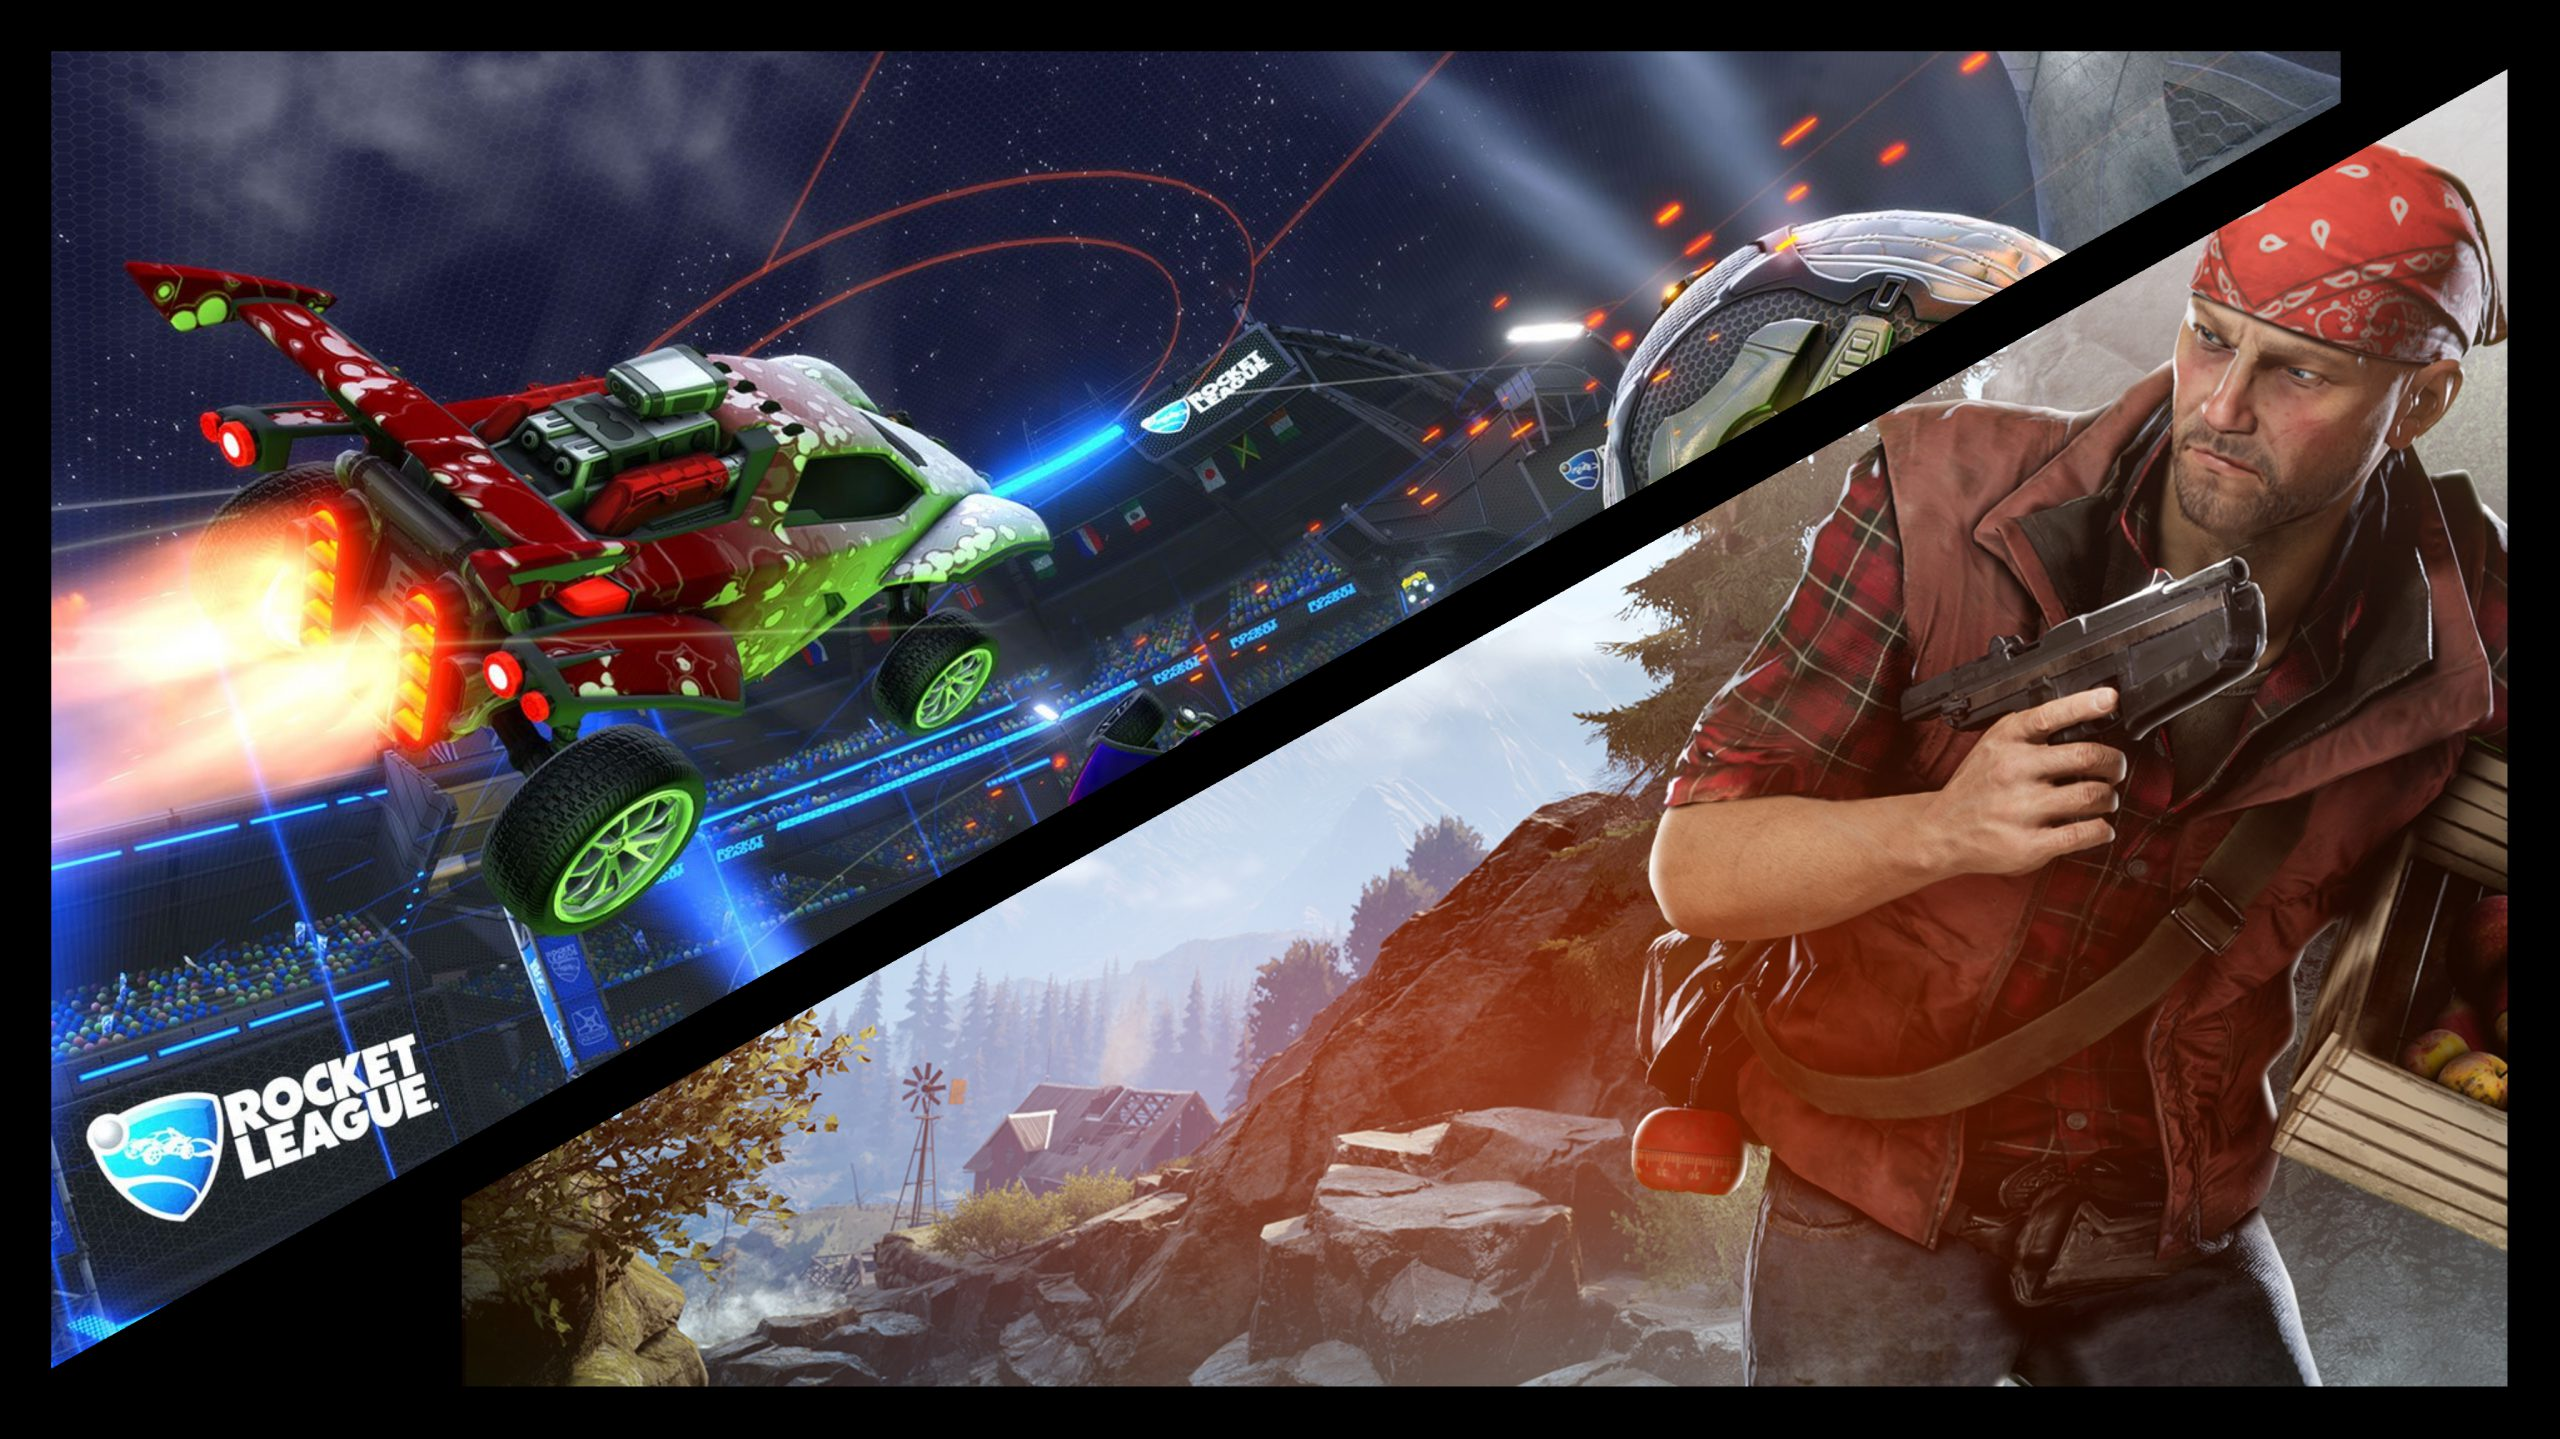 Vigor и Rocket League стали бесплатными на Switch